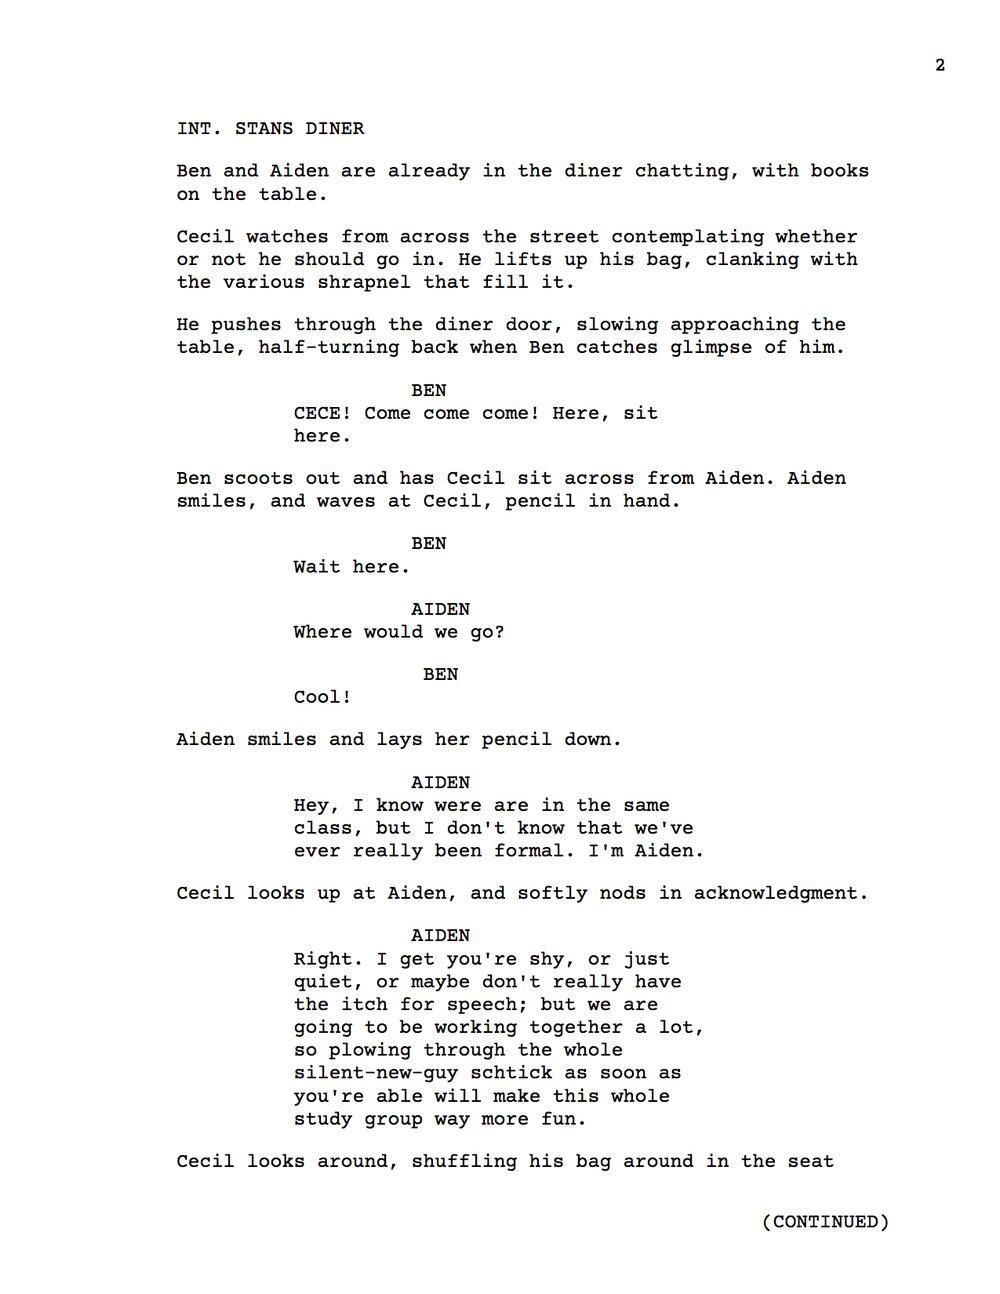 $tan's Diner pg 2.jpg